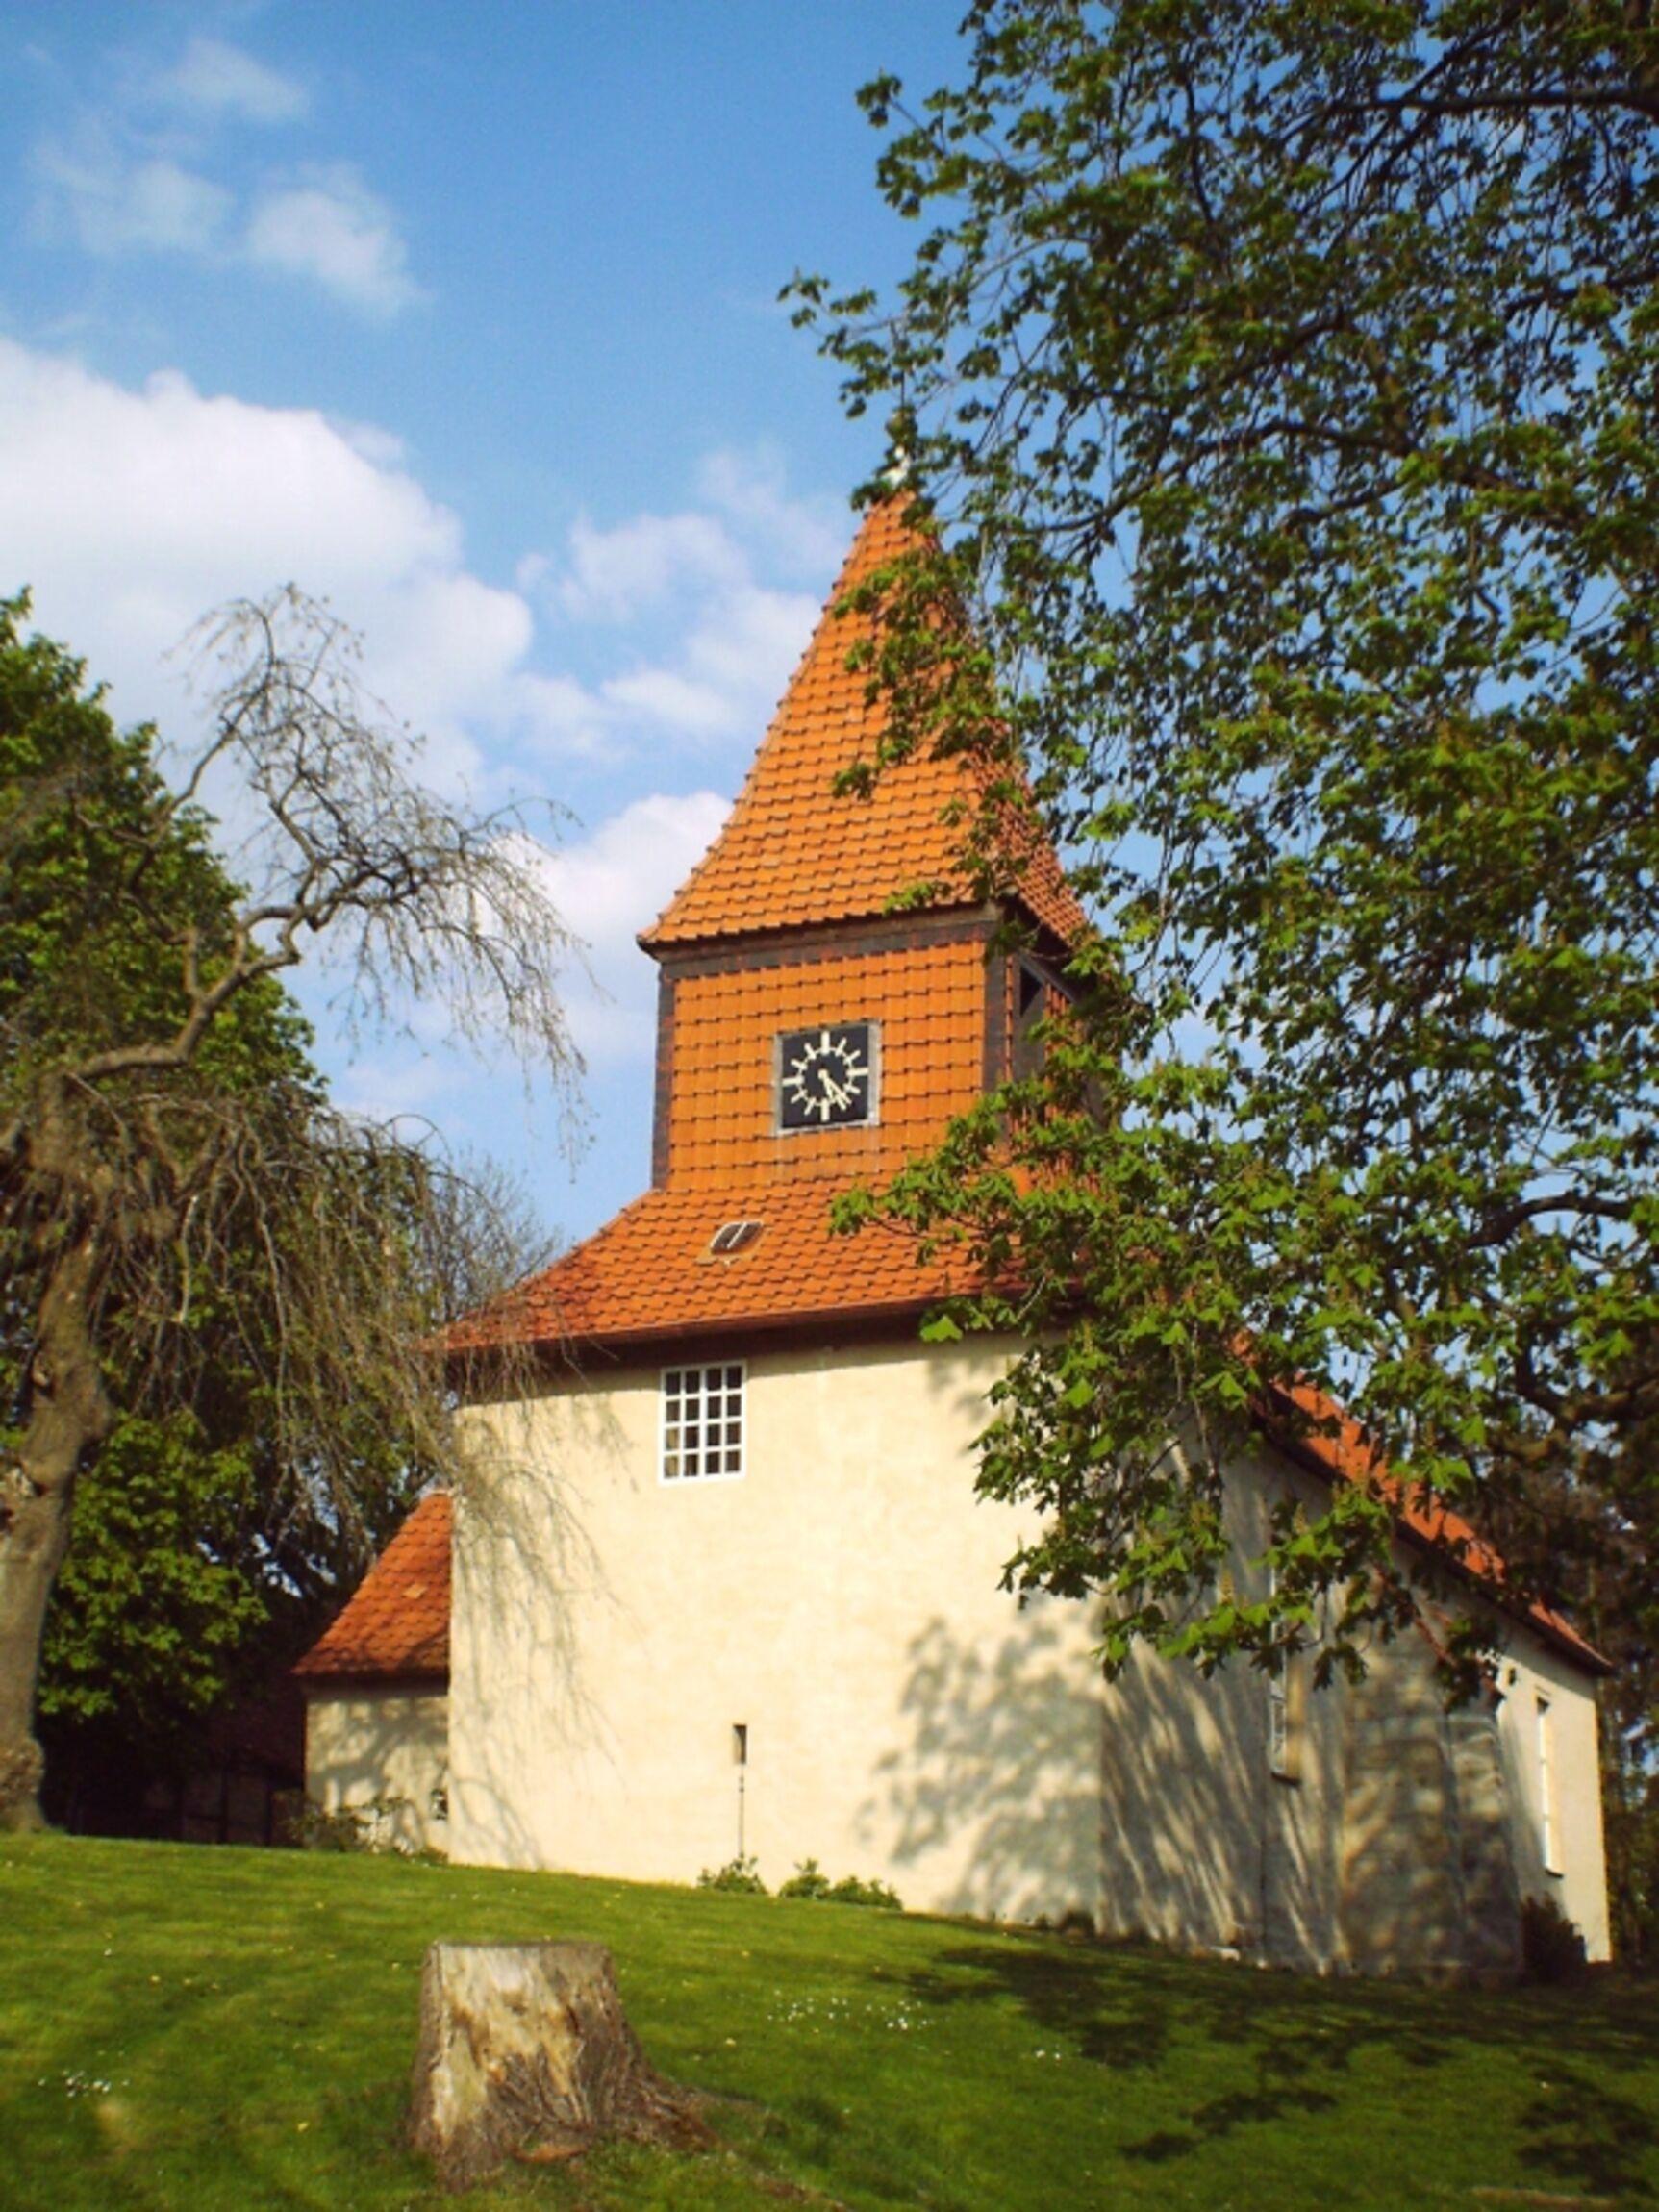 Johannes d. Täufer Wettmershagen